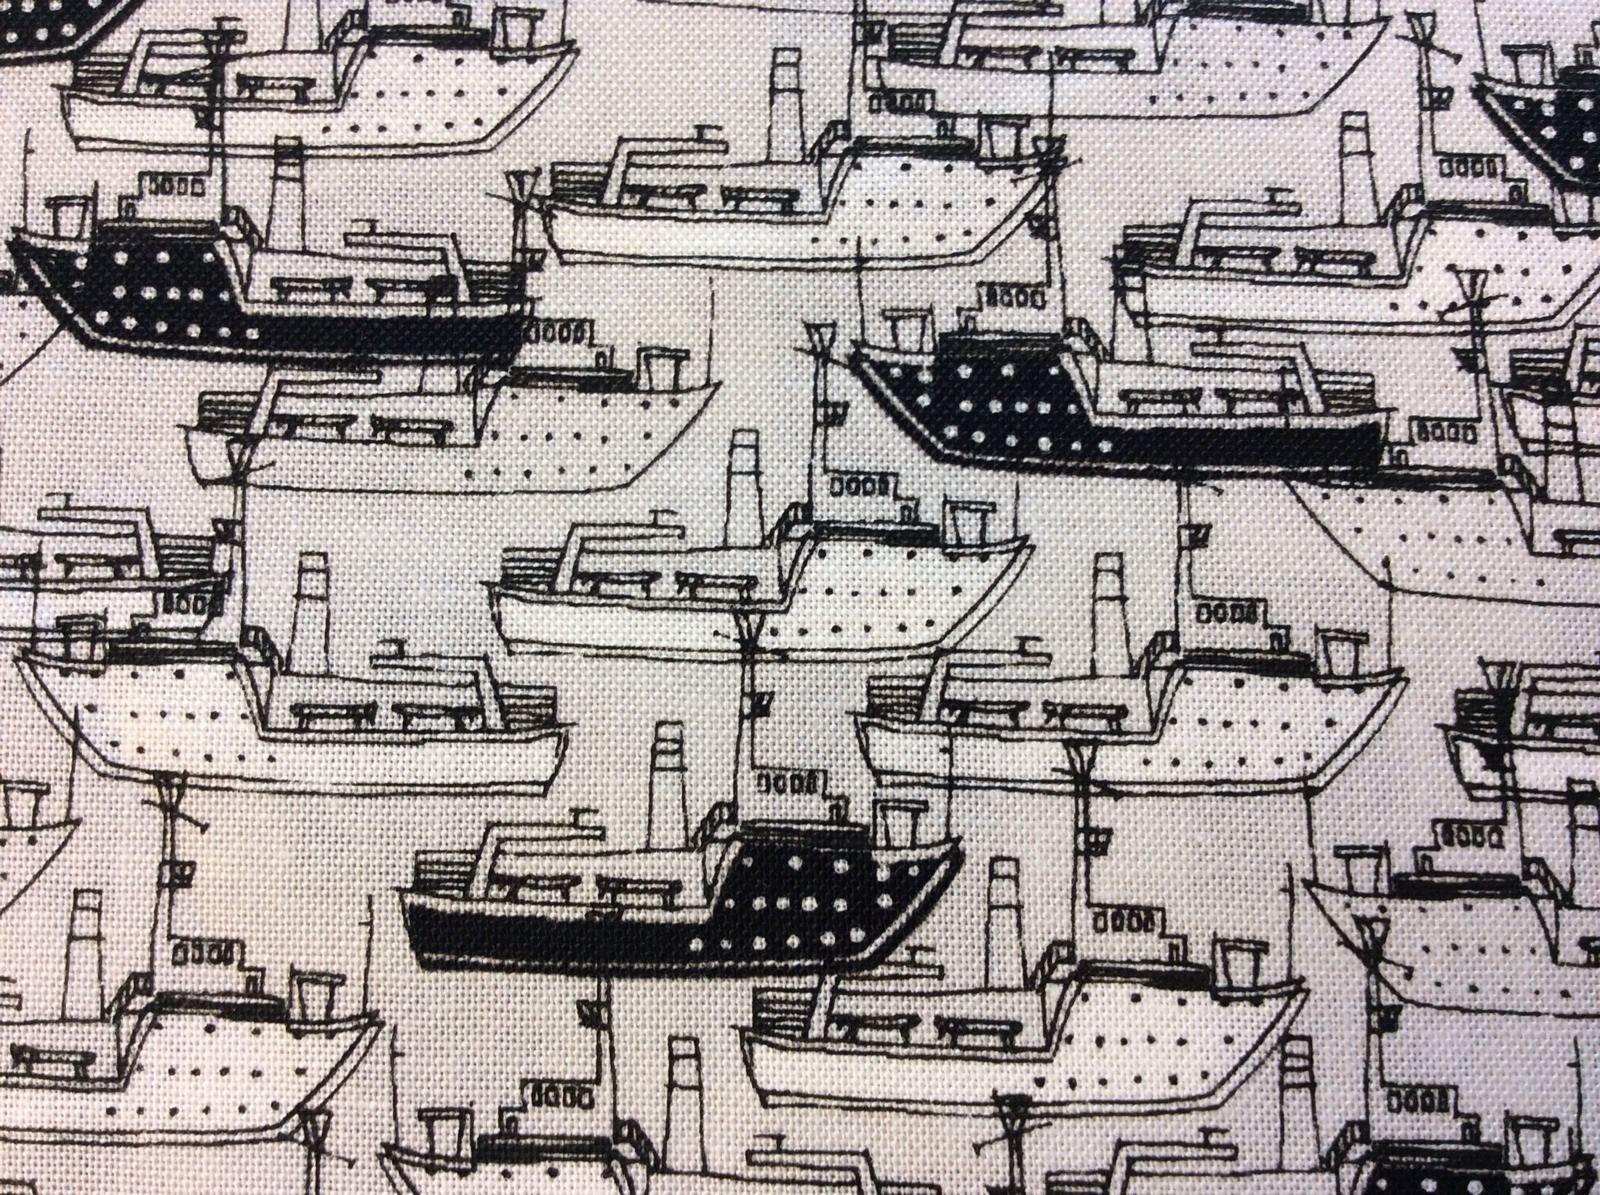 New York City Ships Harbor Boats Shipping Black White Cute Retro Cotton Quilting Fabric PB05